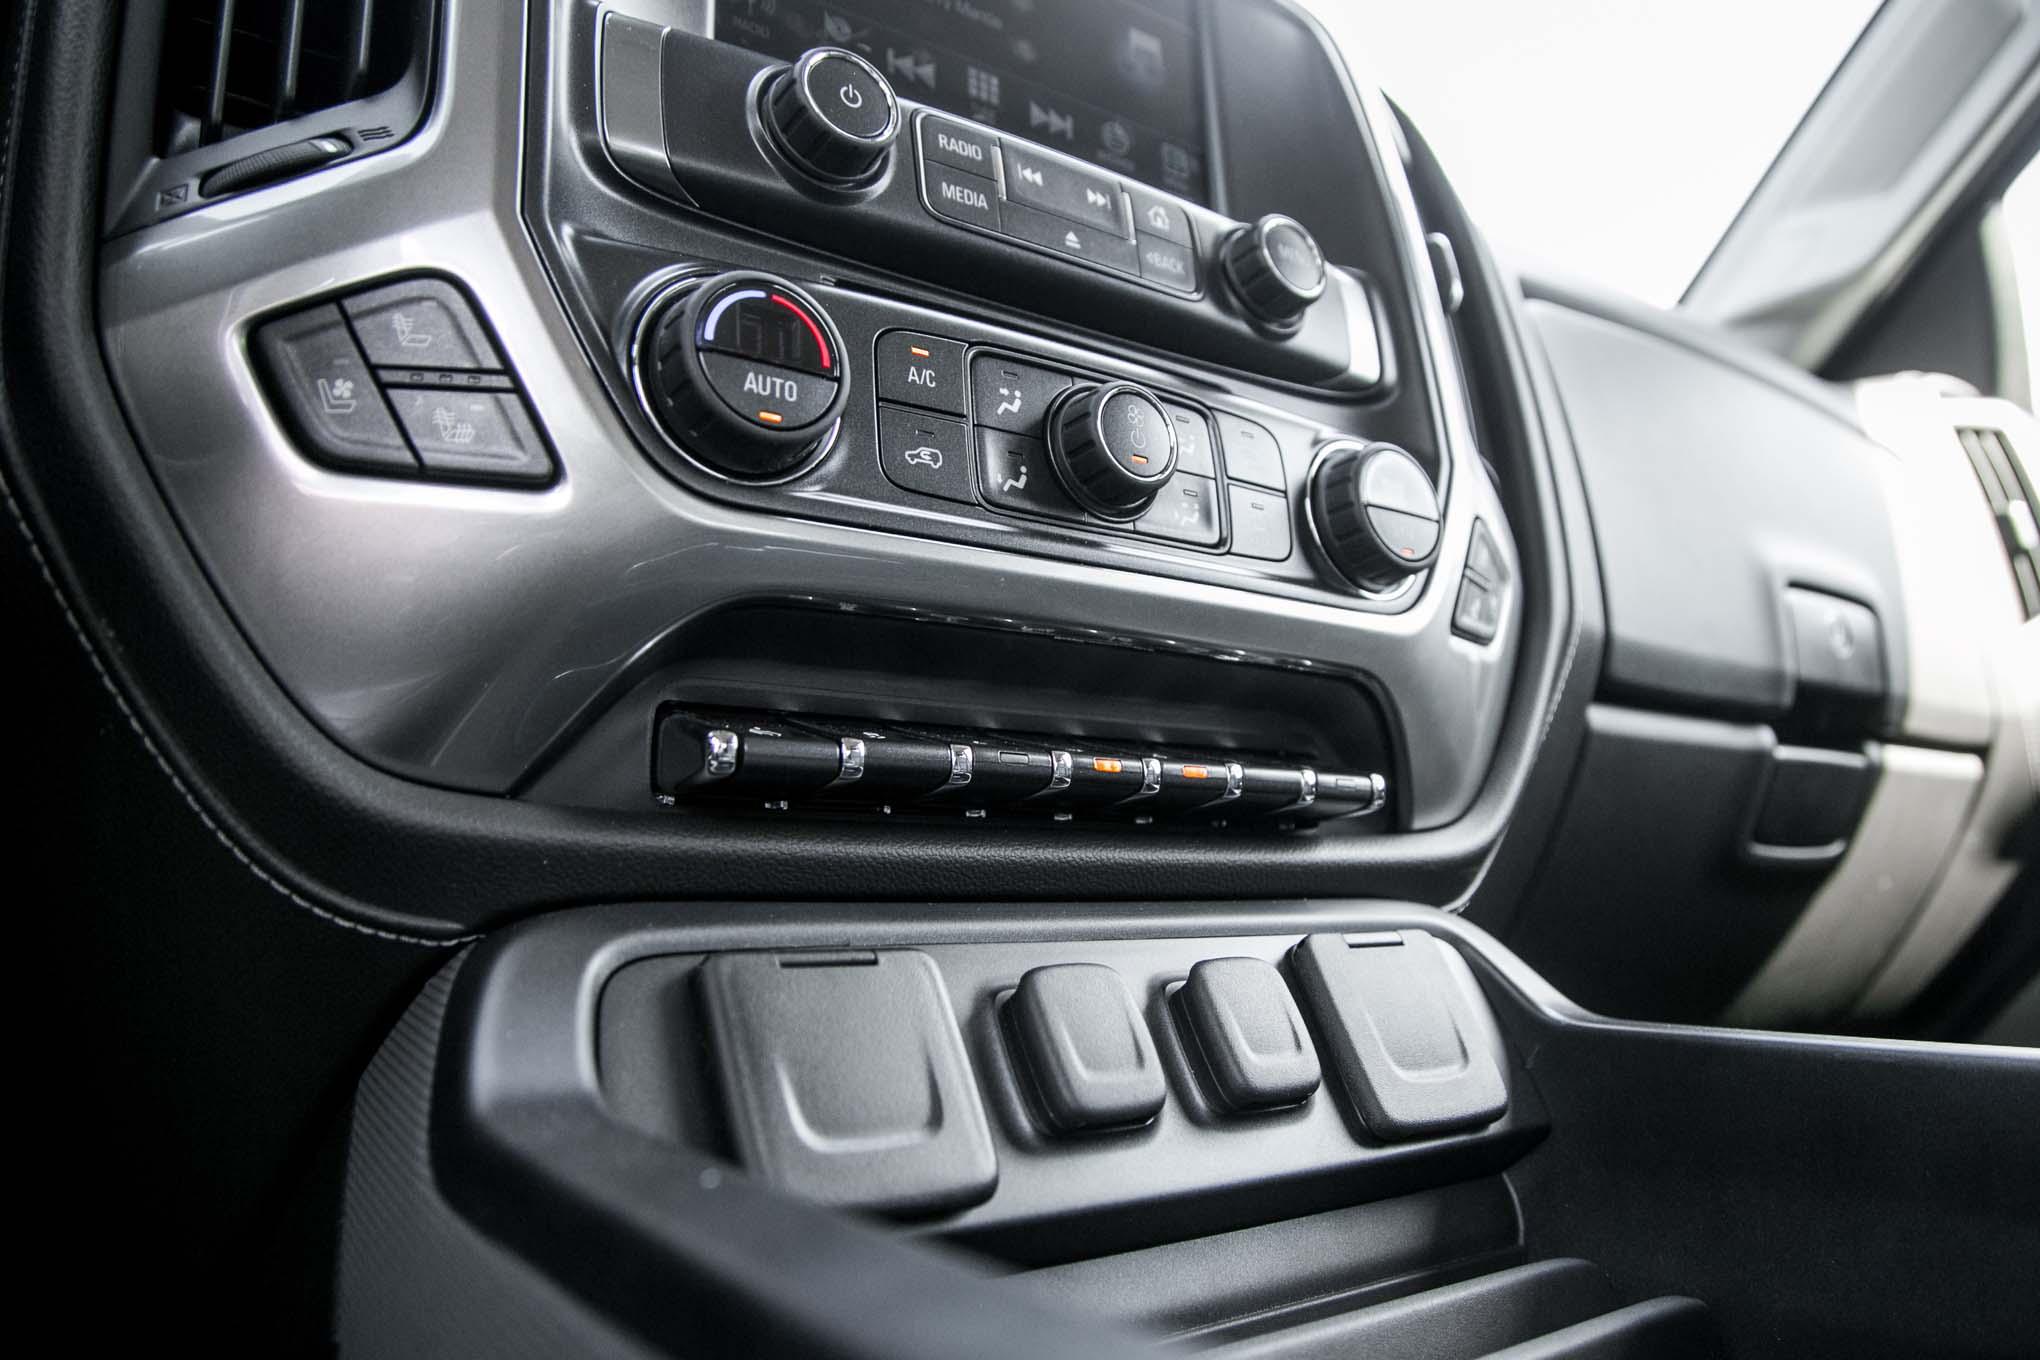 2017 Chevrolet Silverado 2500HD 4WD Z71 LTZ climate ...